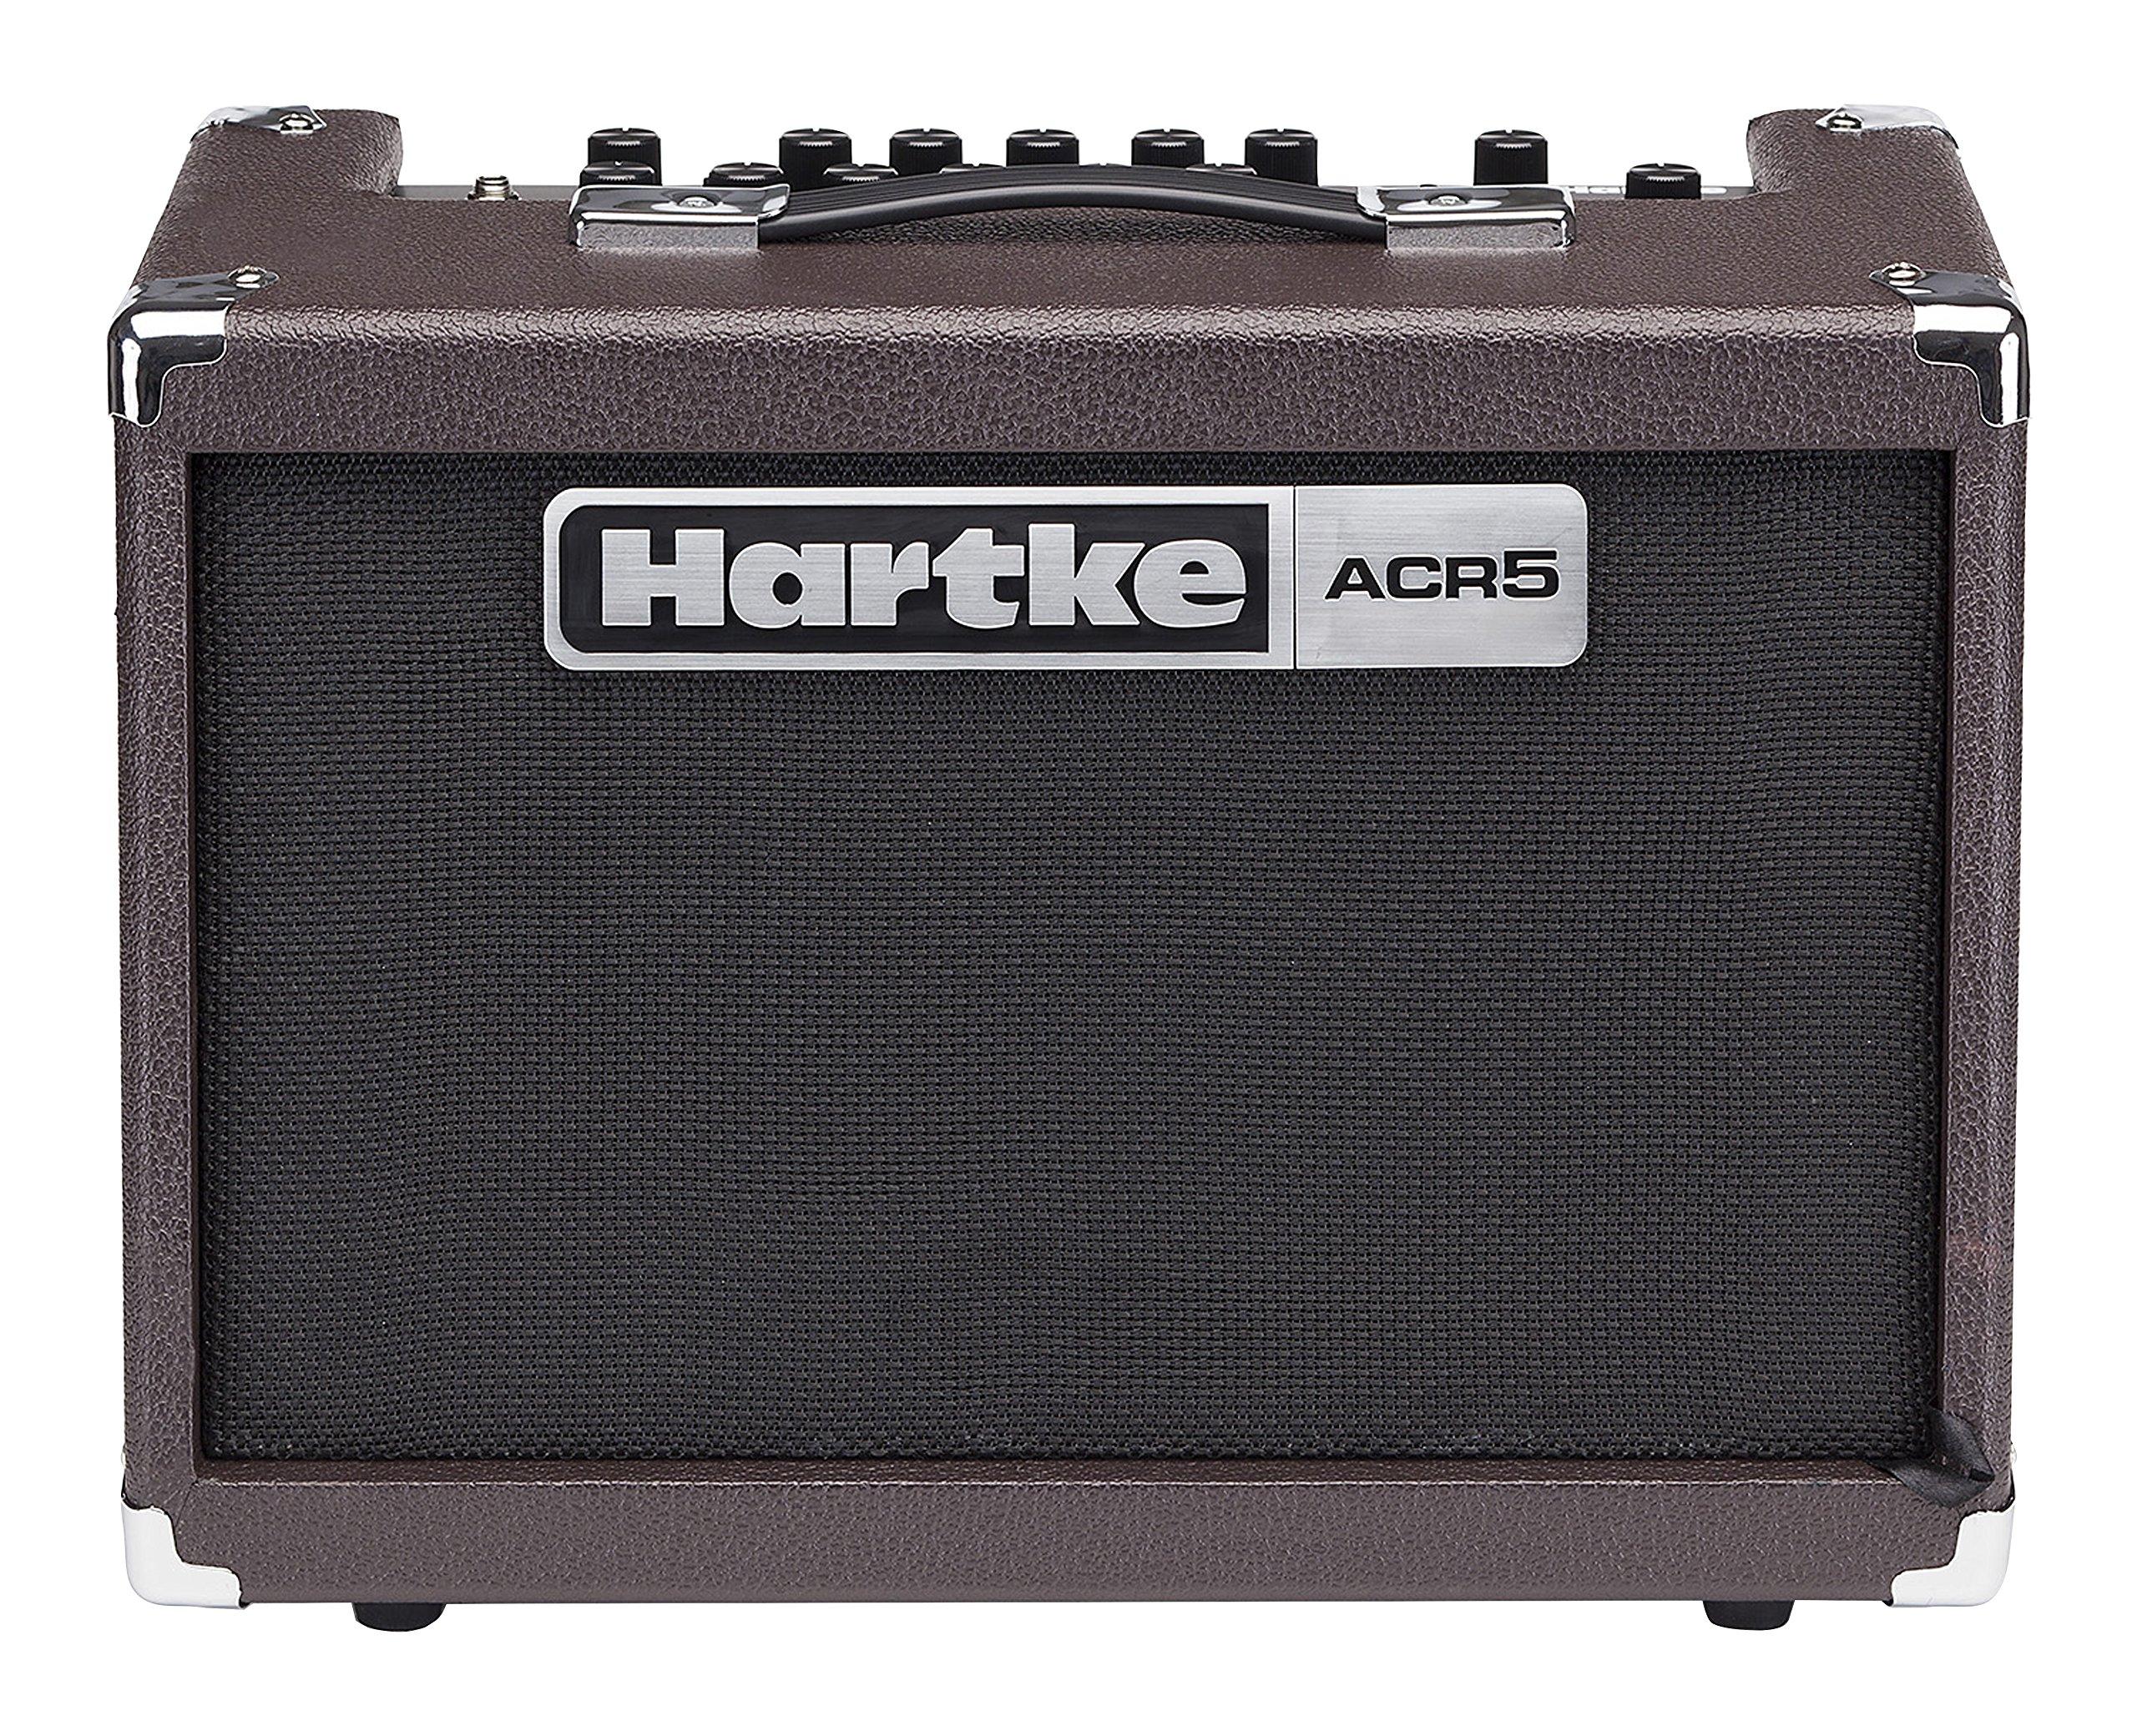 Hartke ACR5 Acoustic Guitar Amplifier by Hartke